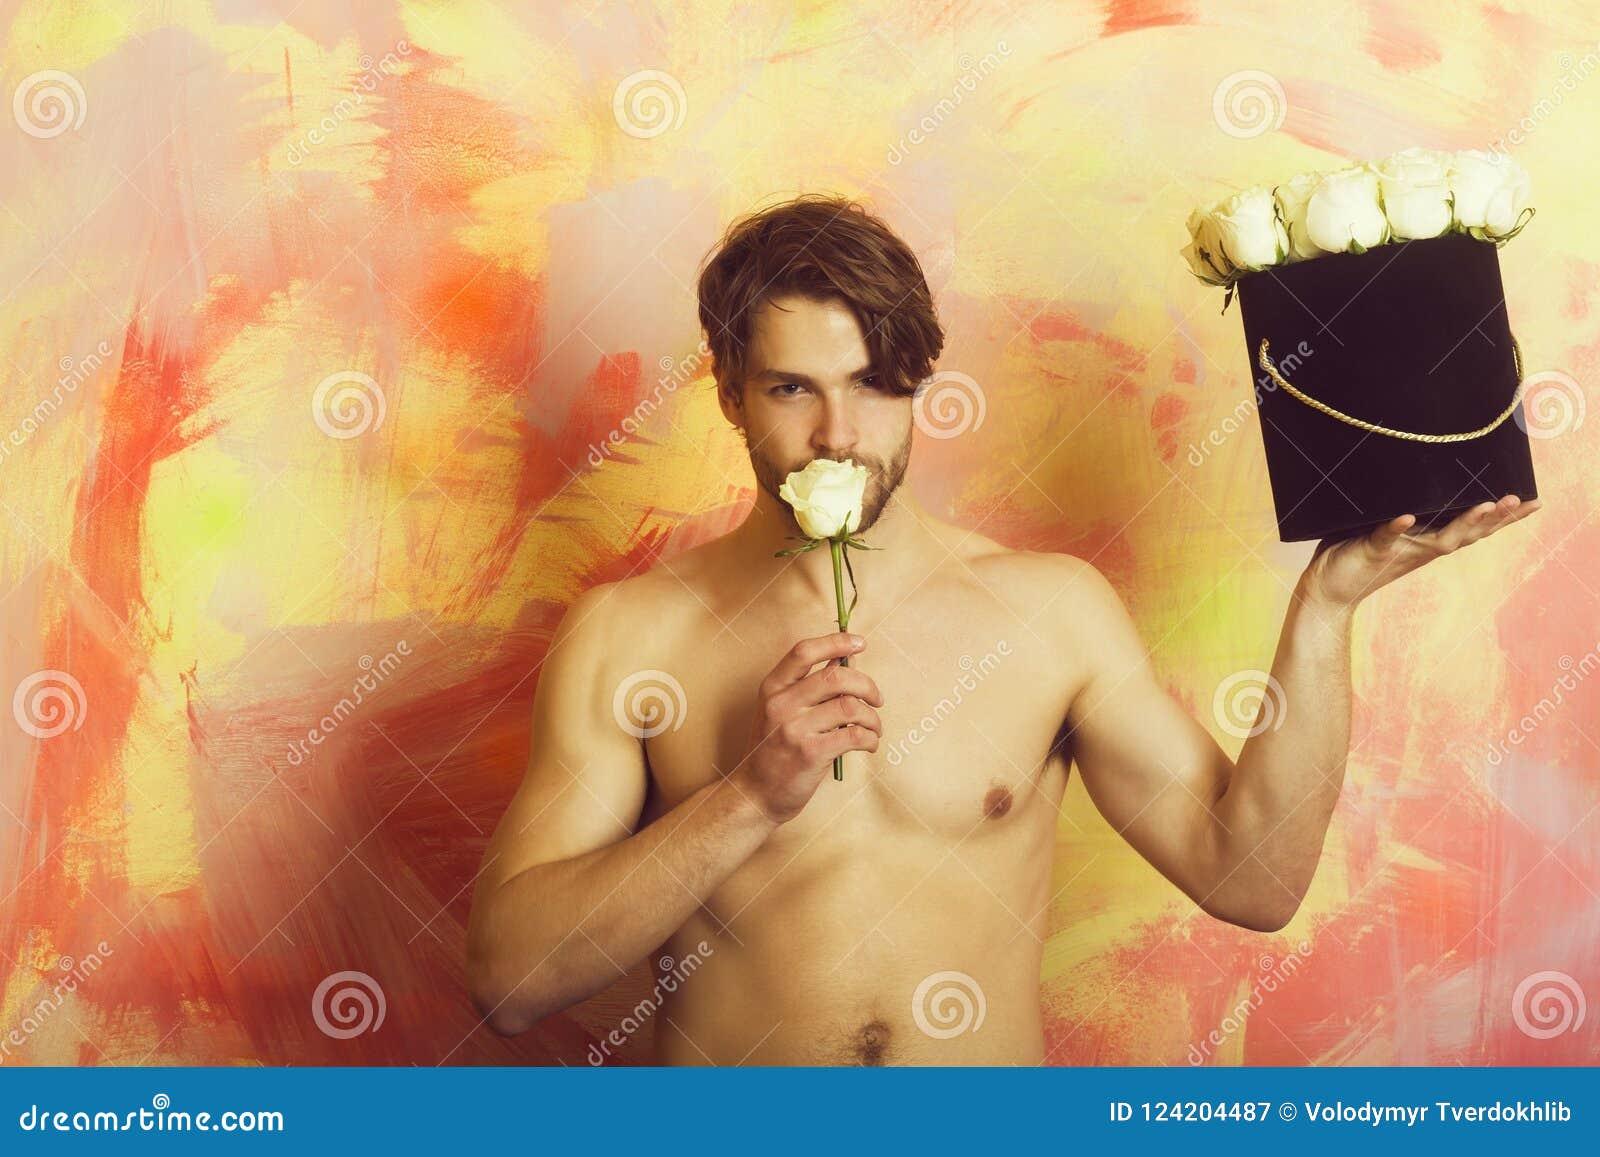 Corkscrew naked man